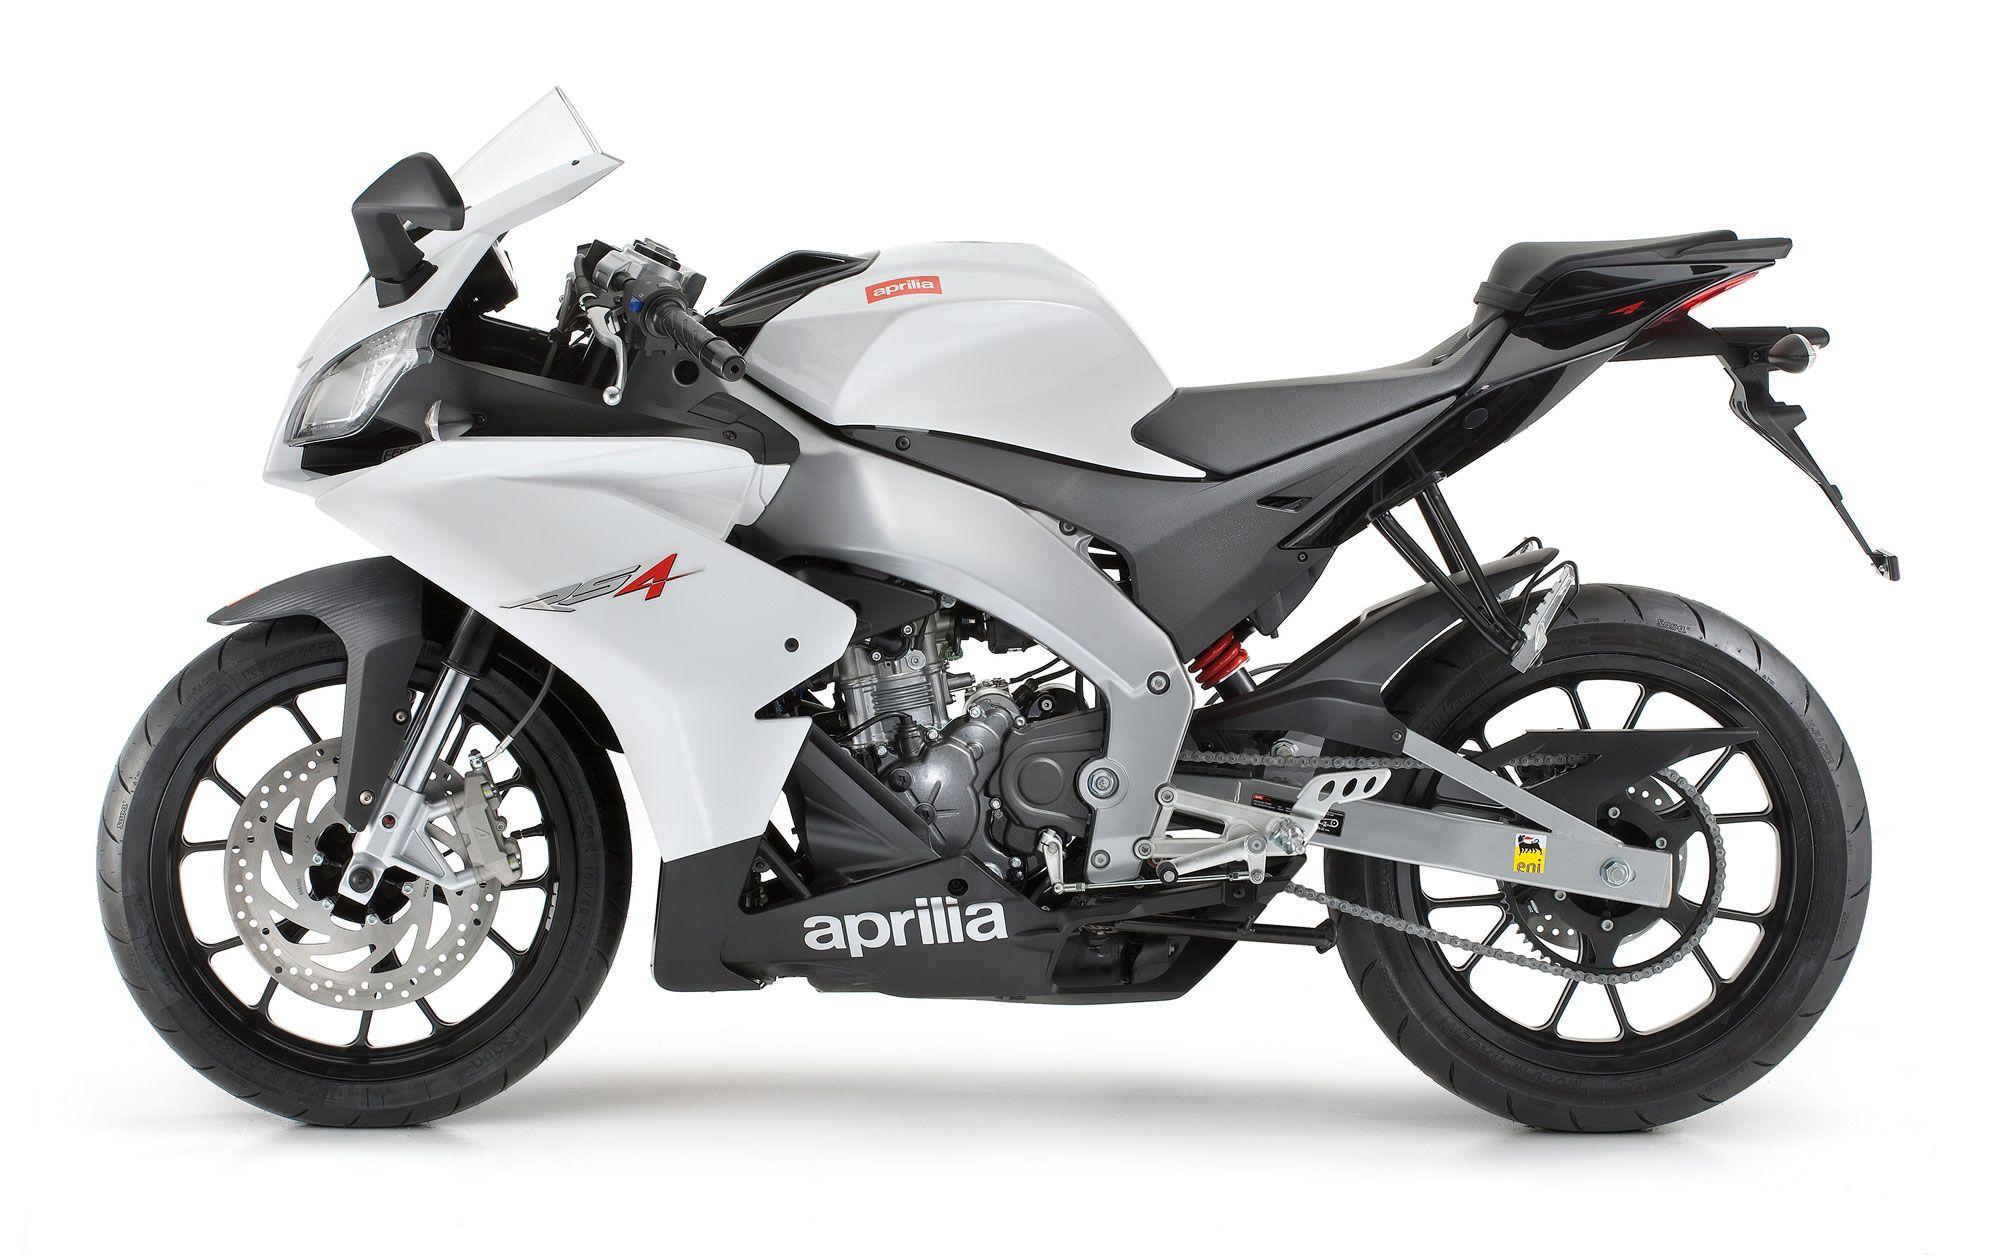 2012 Aprilia 125 , Sport Cars and Motorcycle News , 2012 Aprilia 125